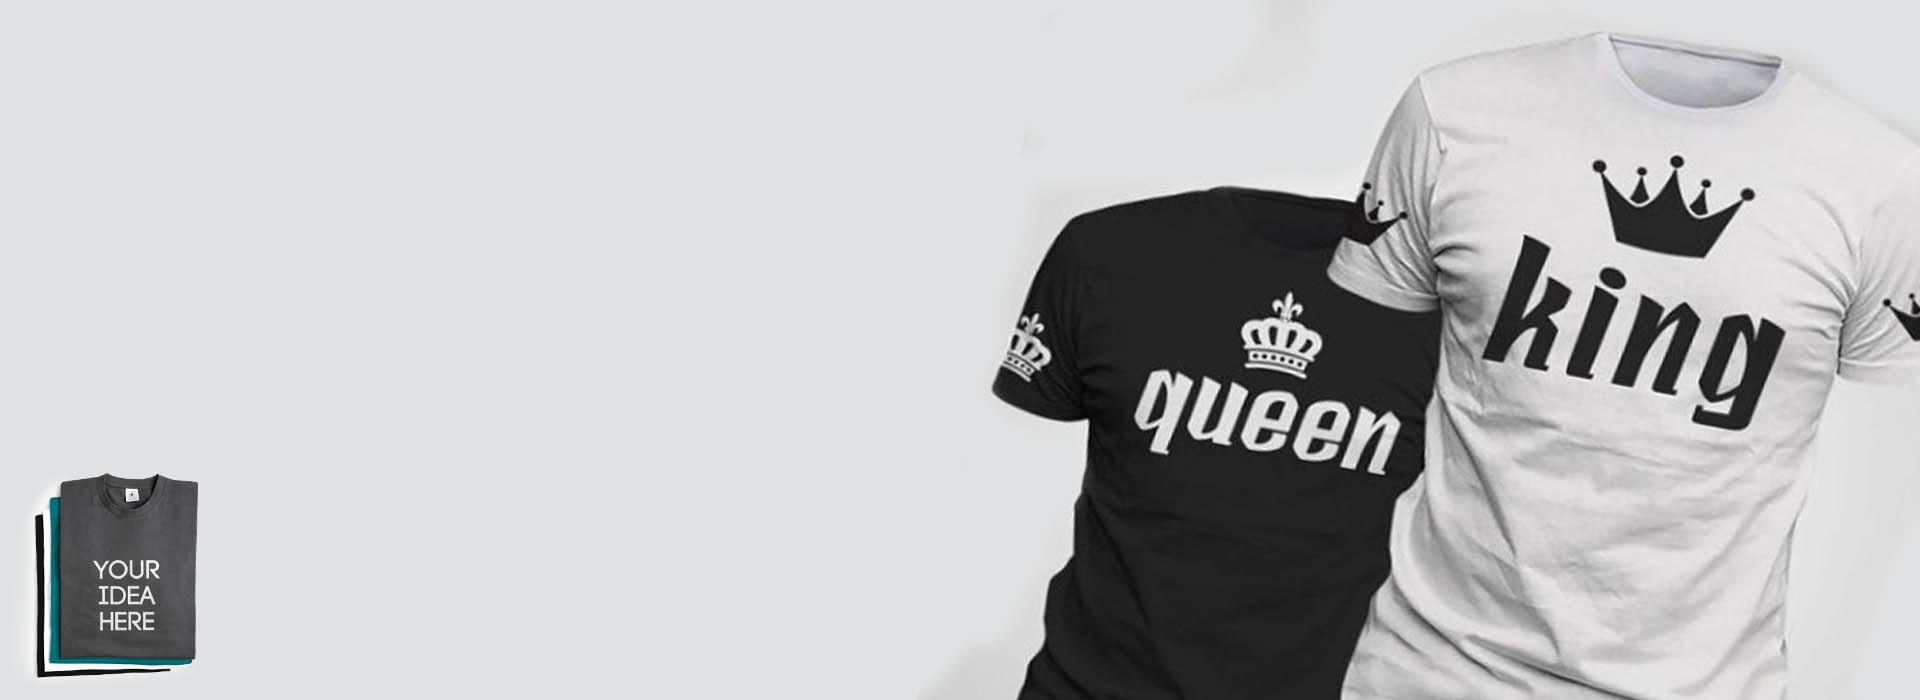 tricouri-set-personalizate.jpg